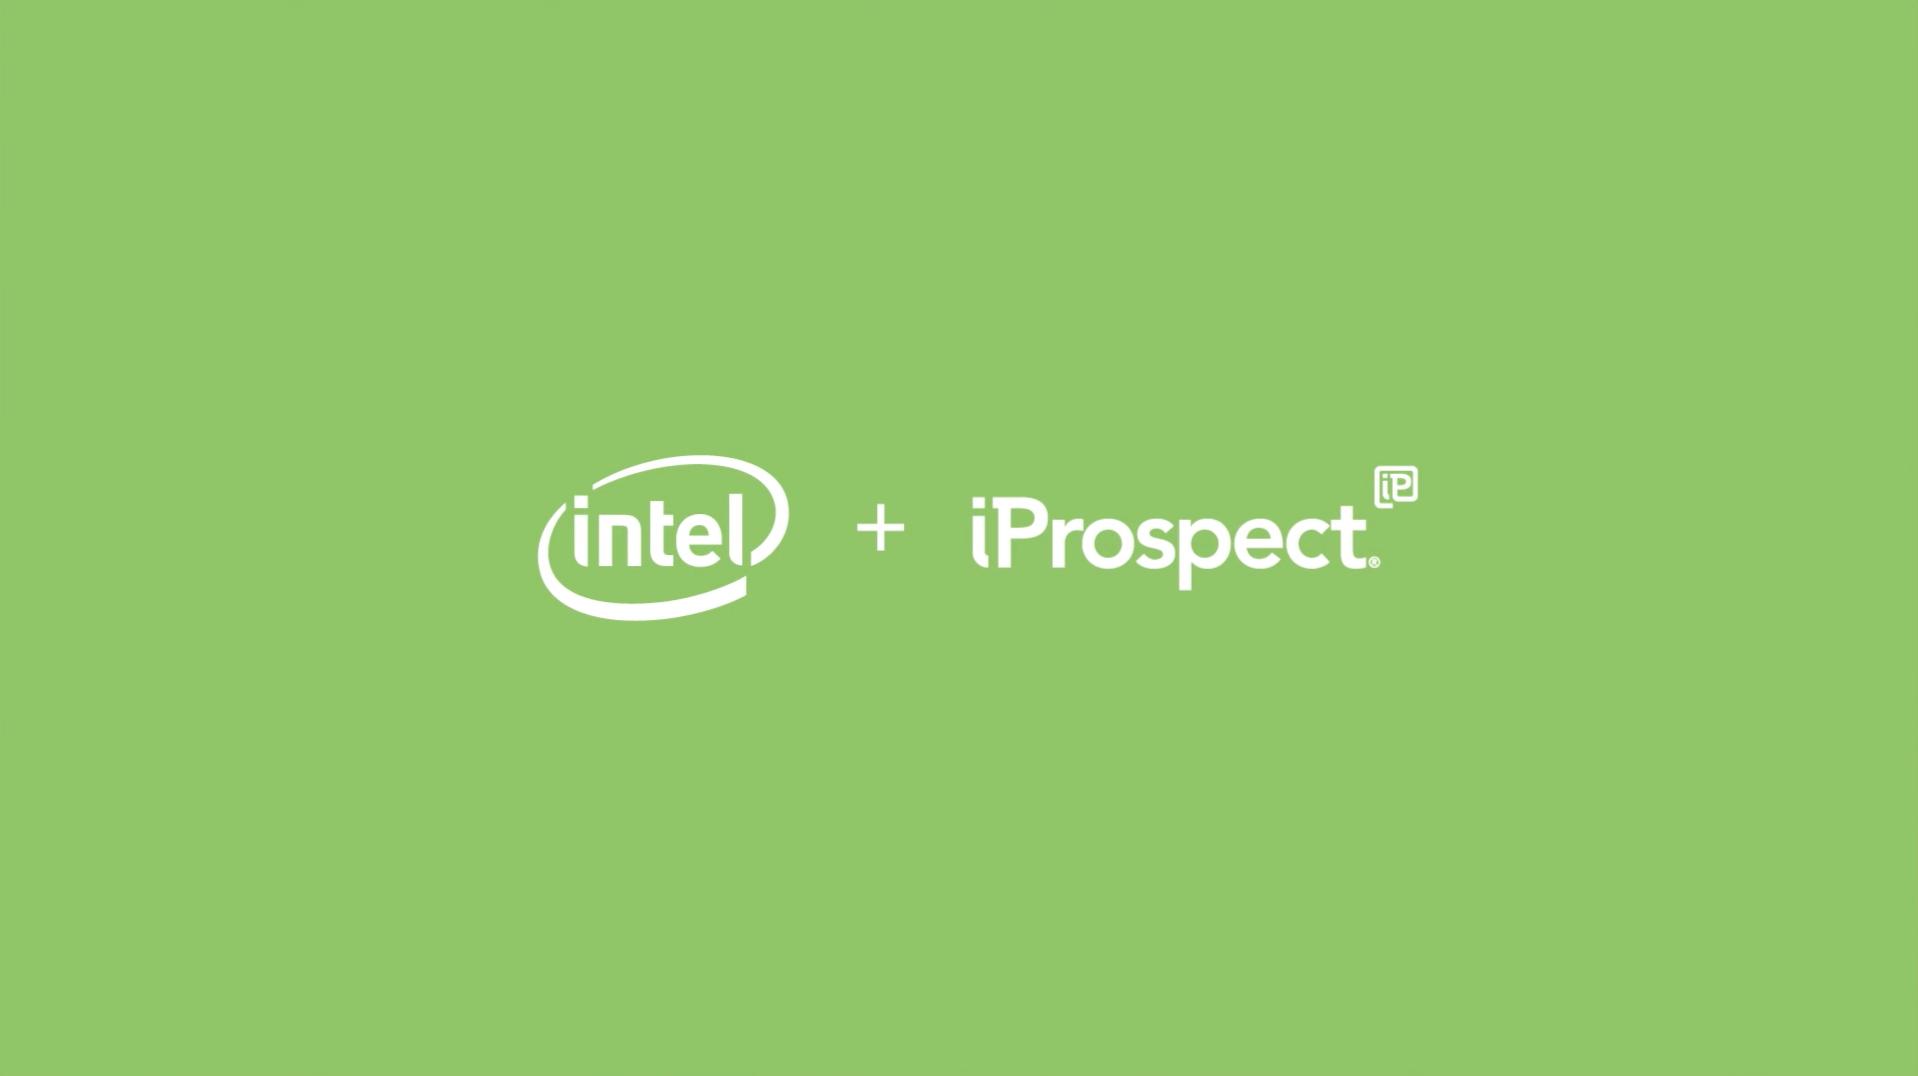 iProspect Intel